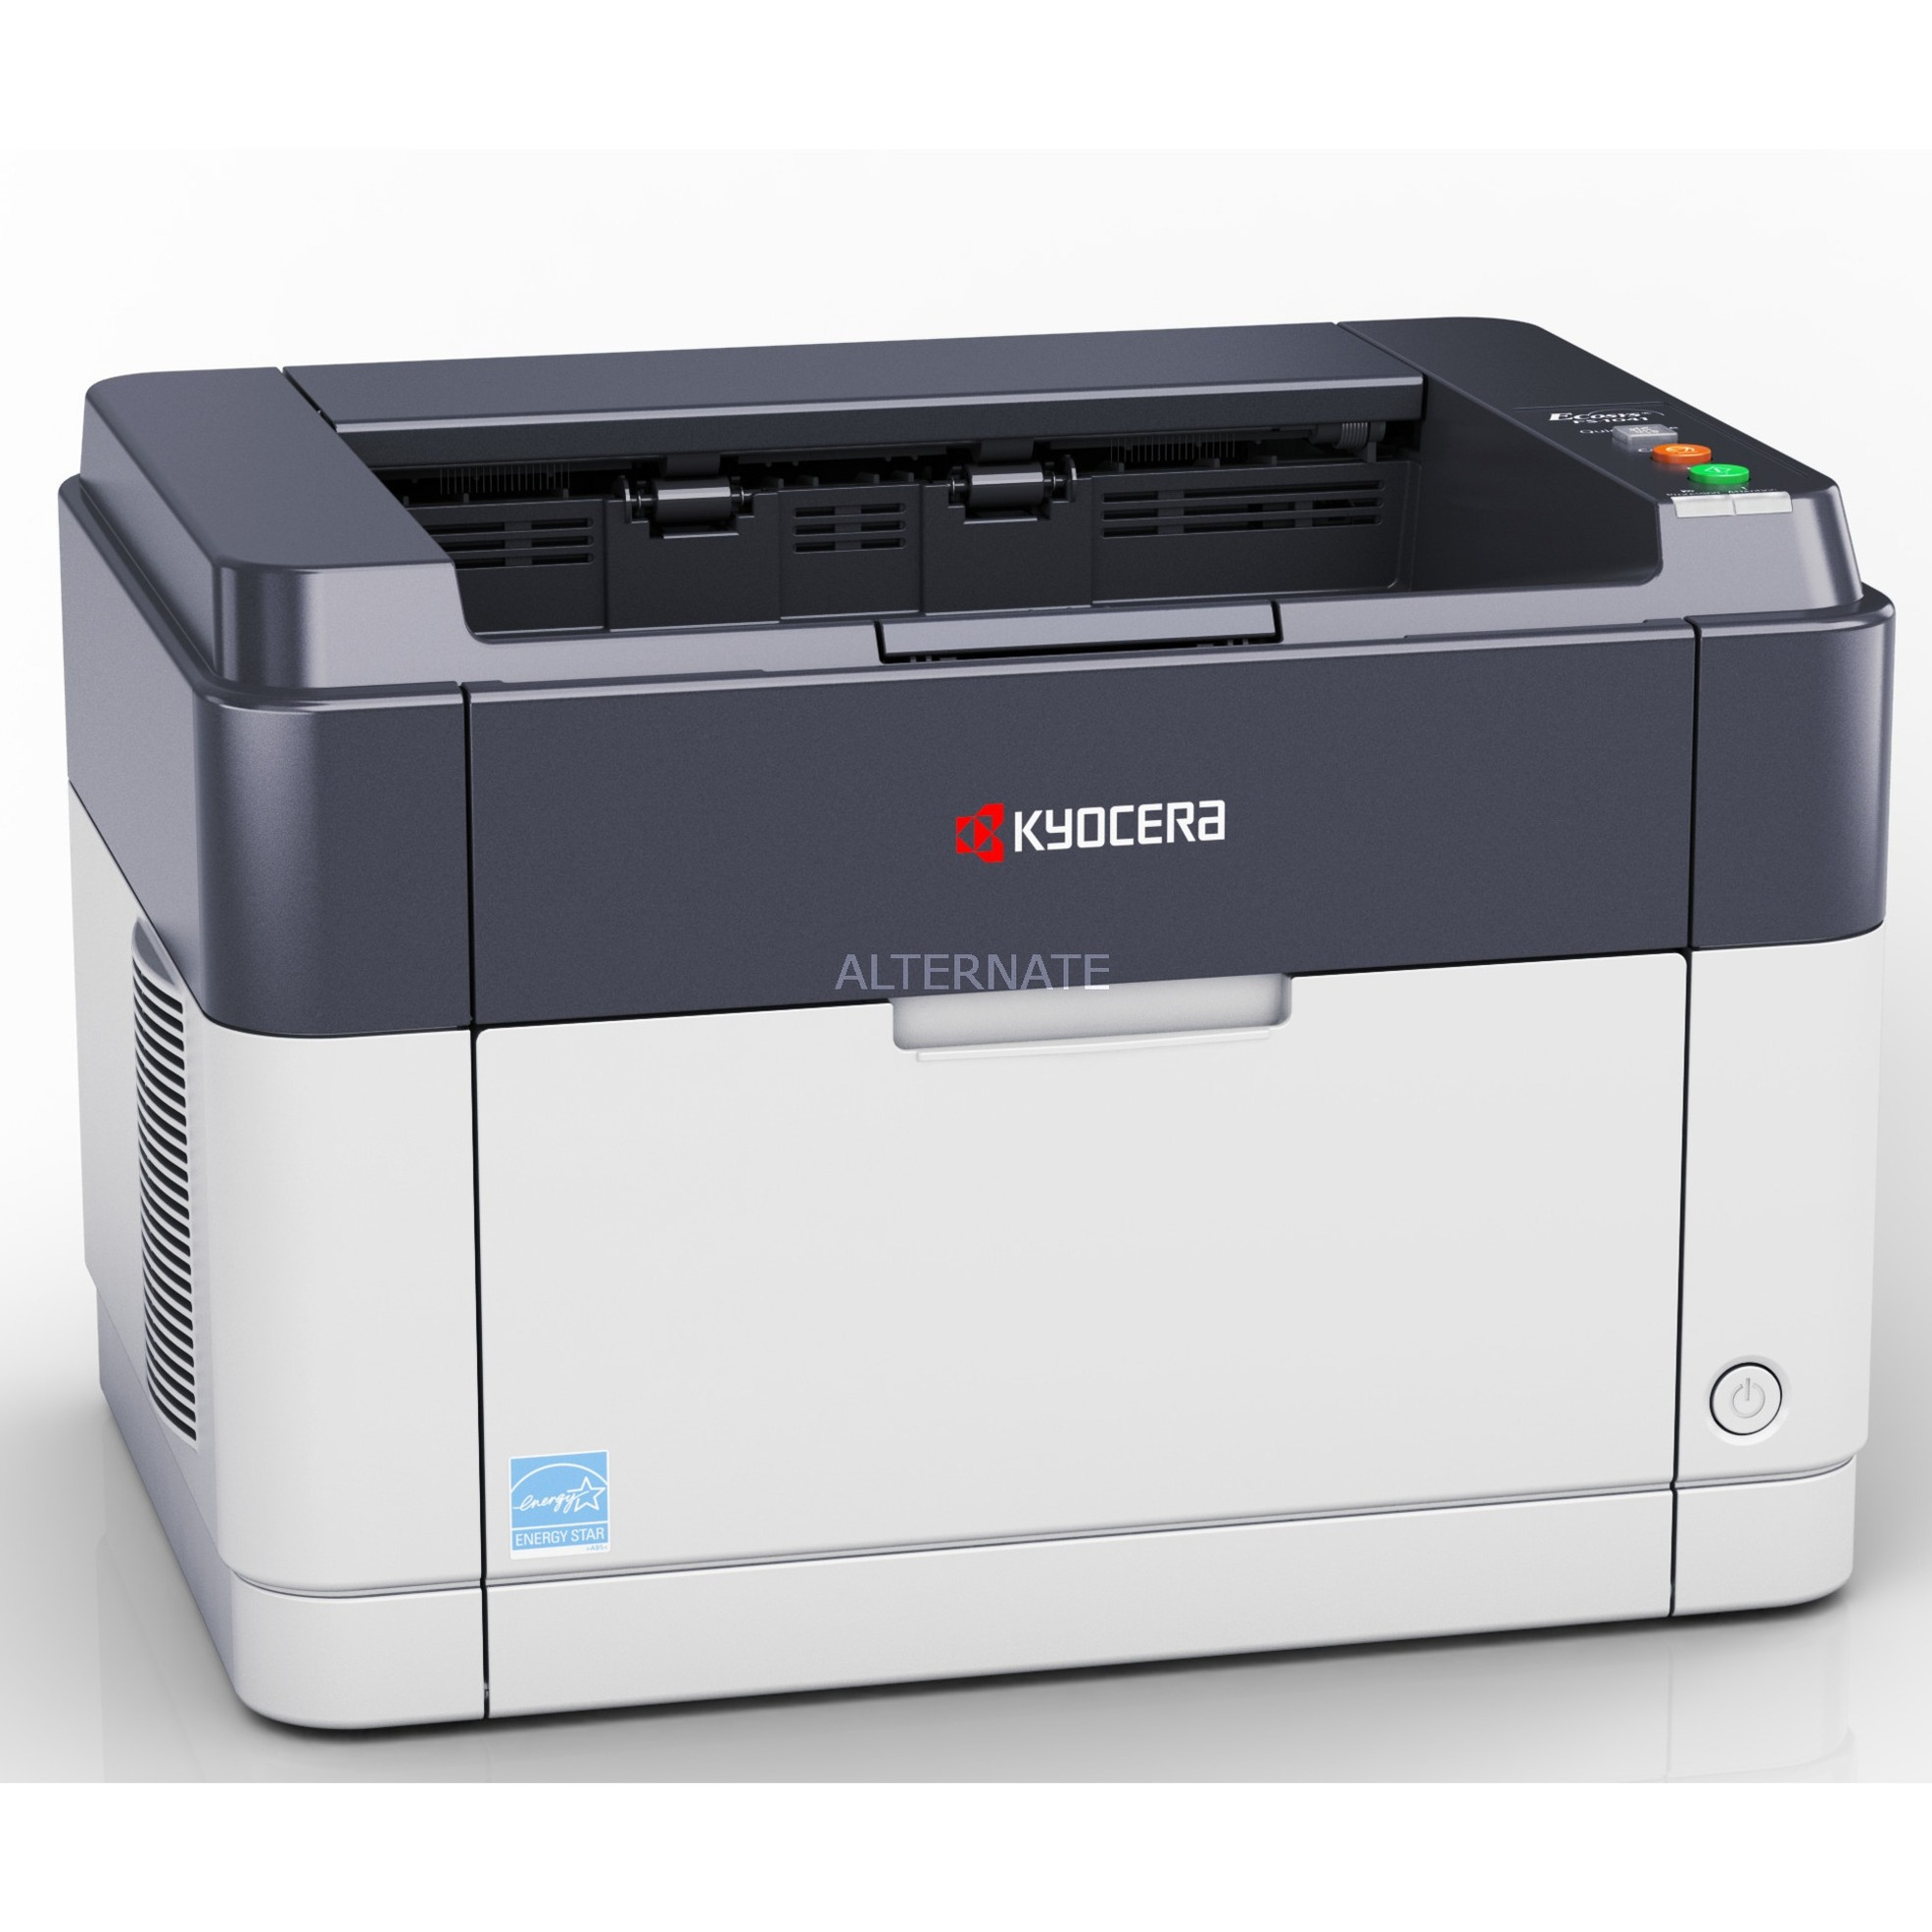 1102M23NL2, Impresora láser